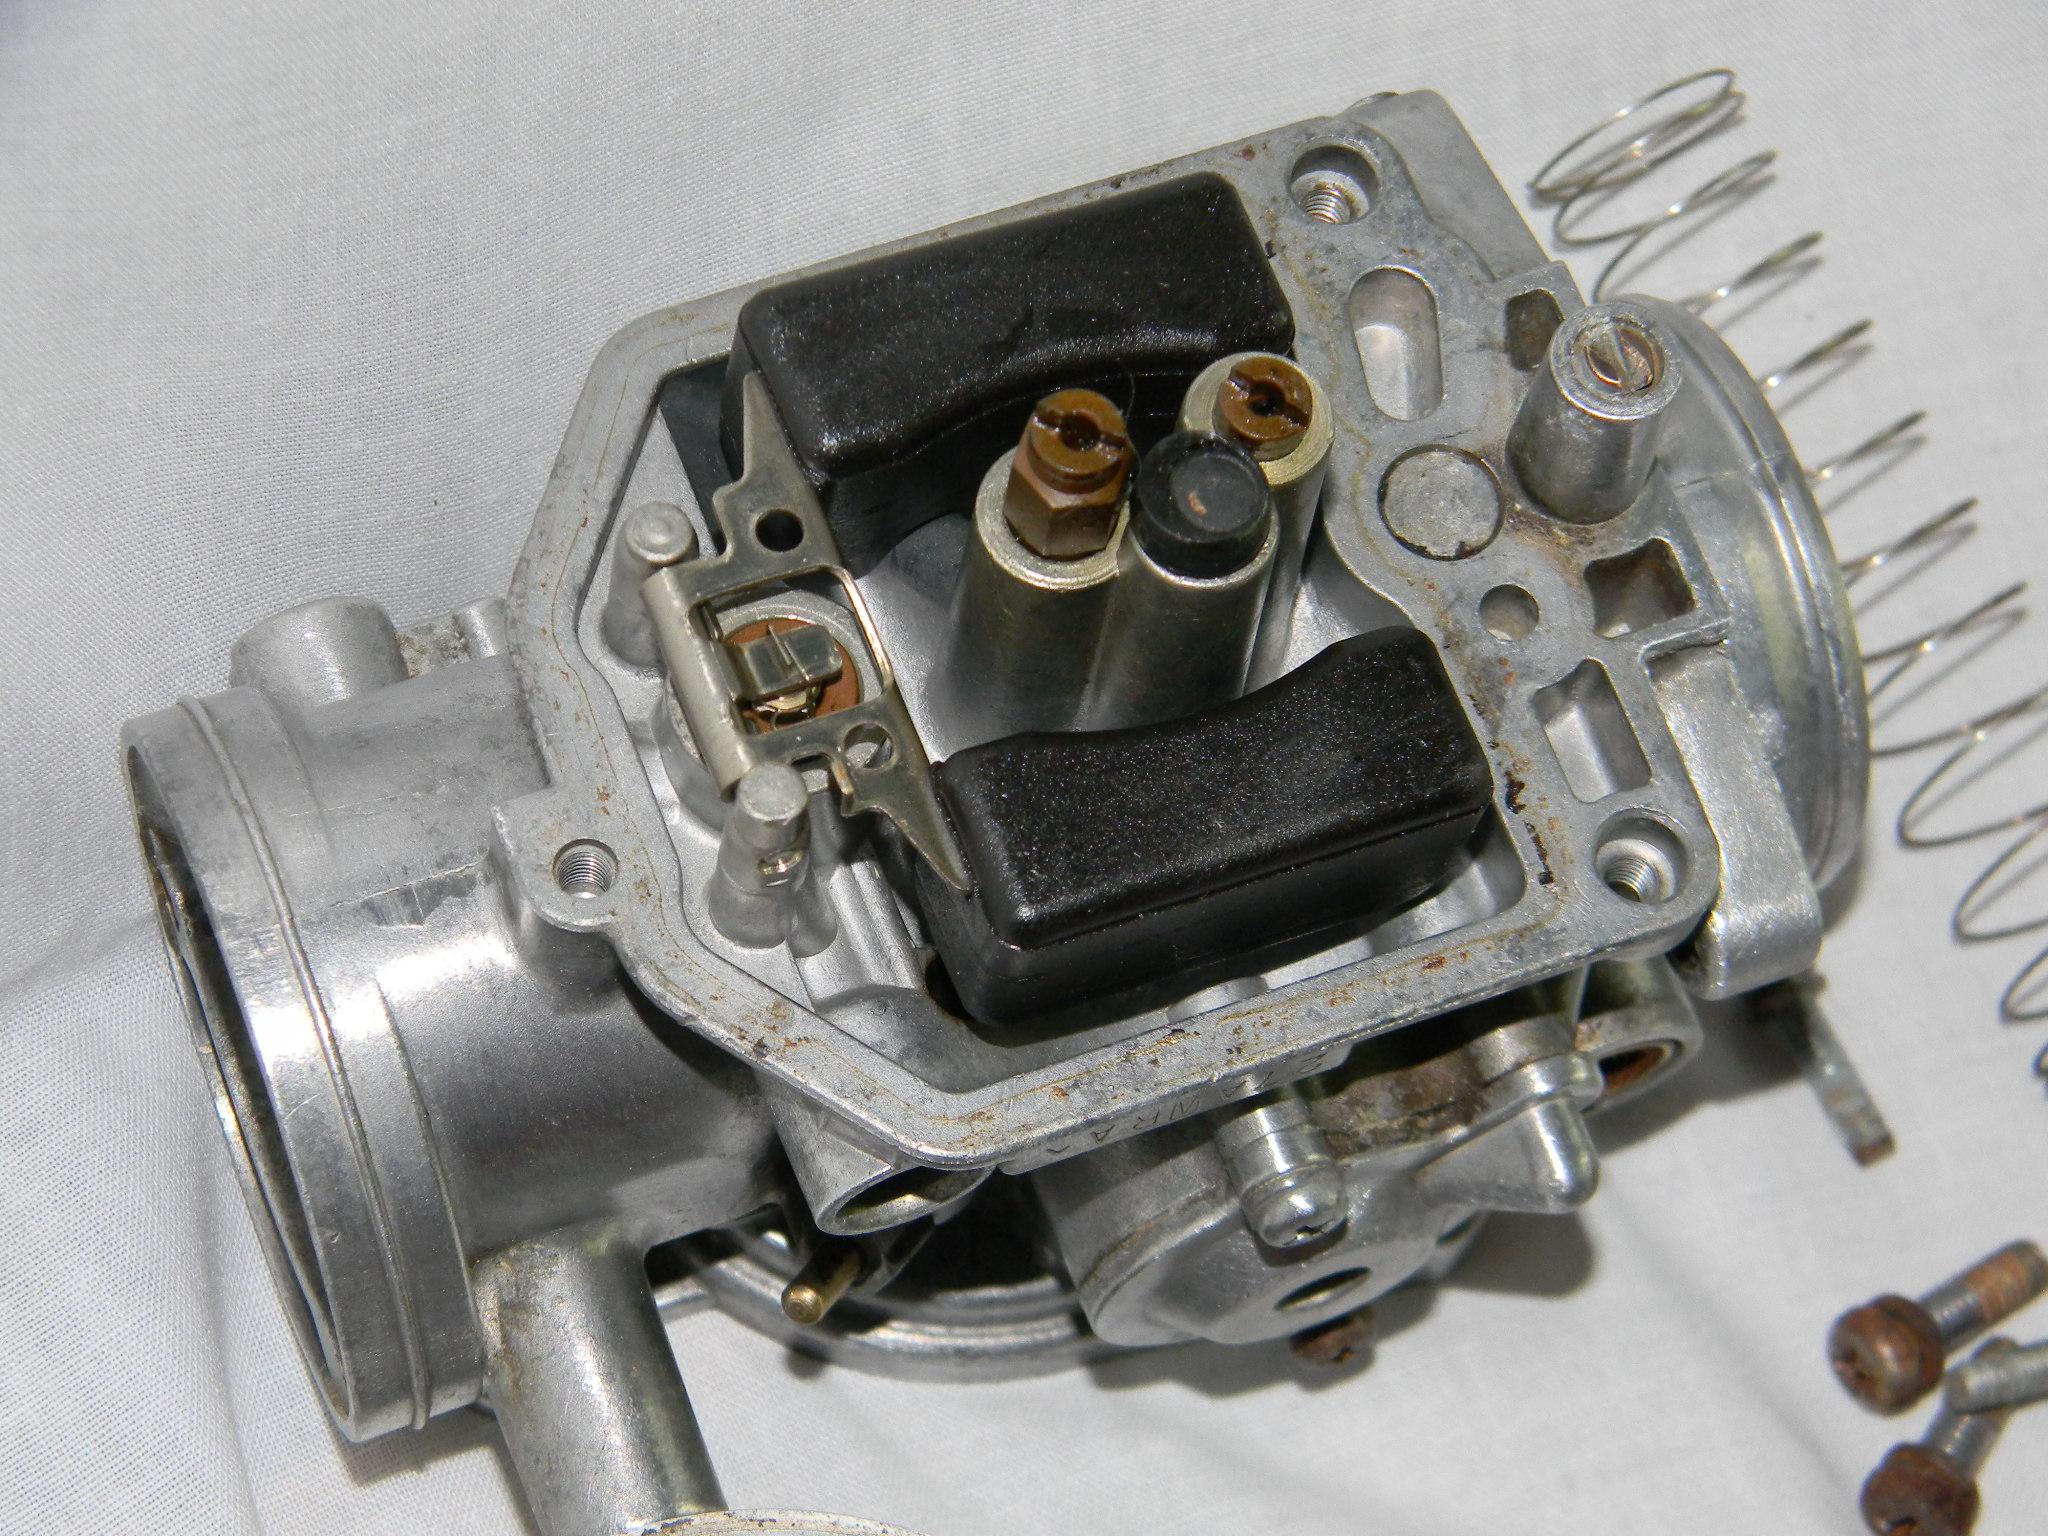 Cx500 Carb Upgrade